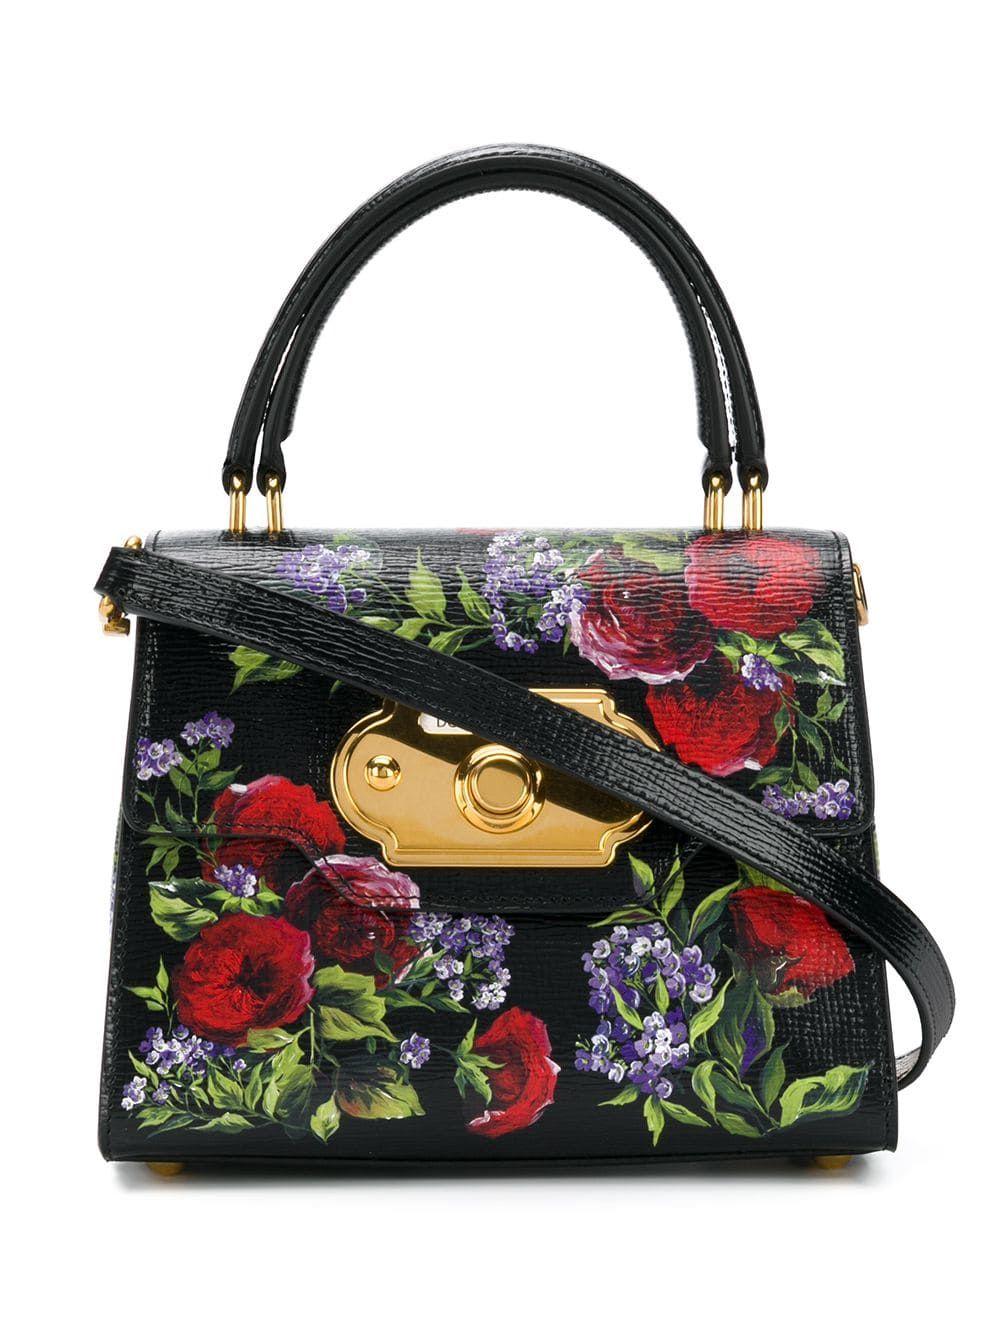 Dolce Gabbana Dolce Gabbana Floral Print Tote Bag Schwarz